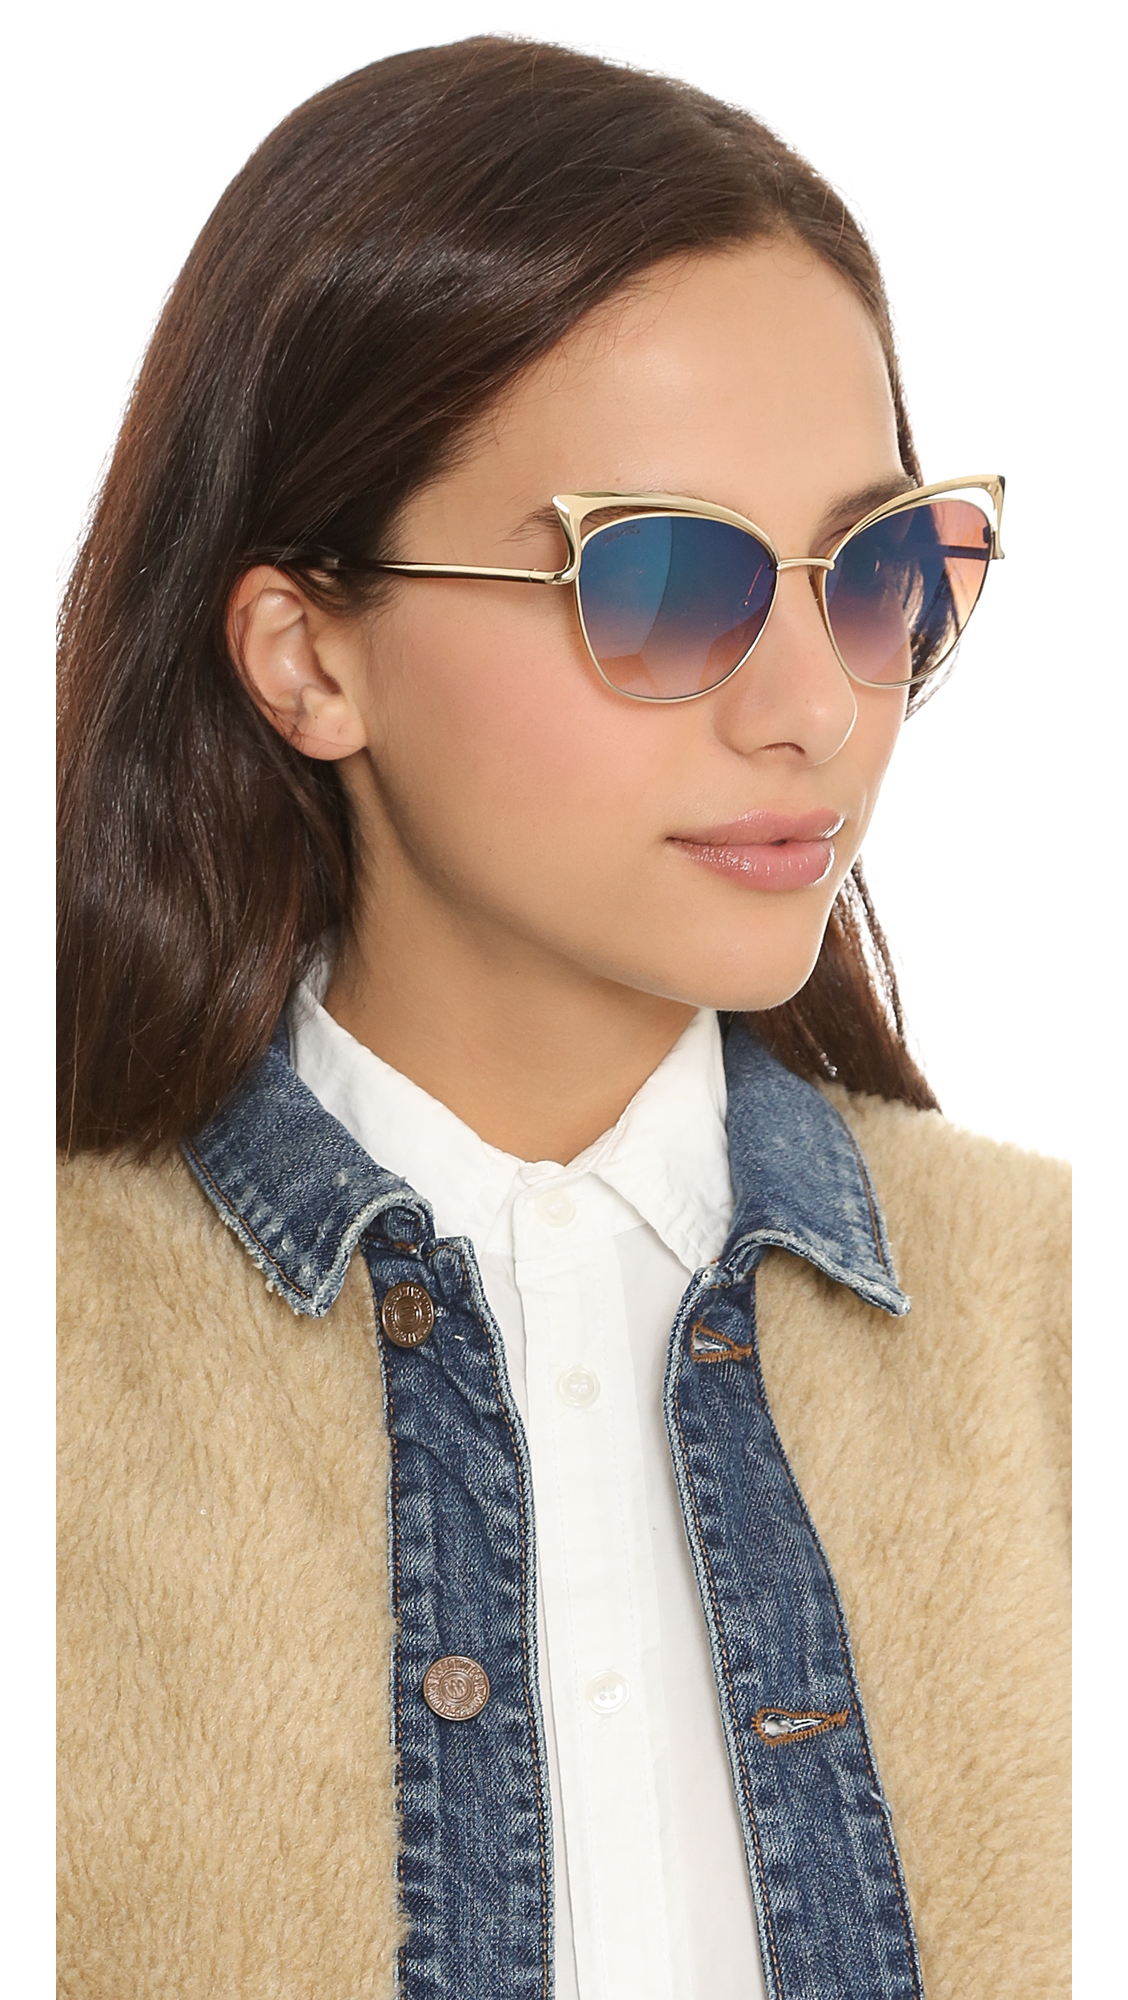 99f11f21ca1 Dita Von Teese Eyewear Femme Totale Sunglasses